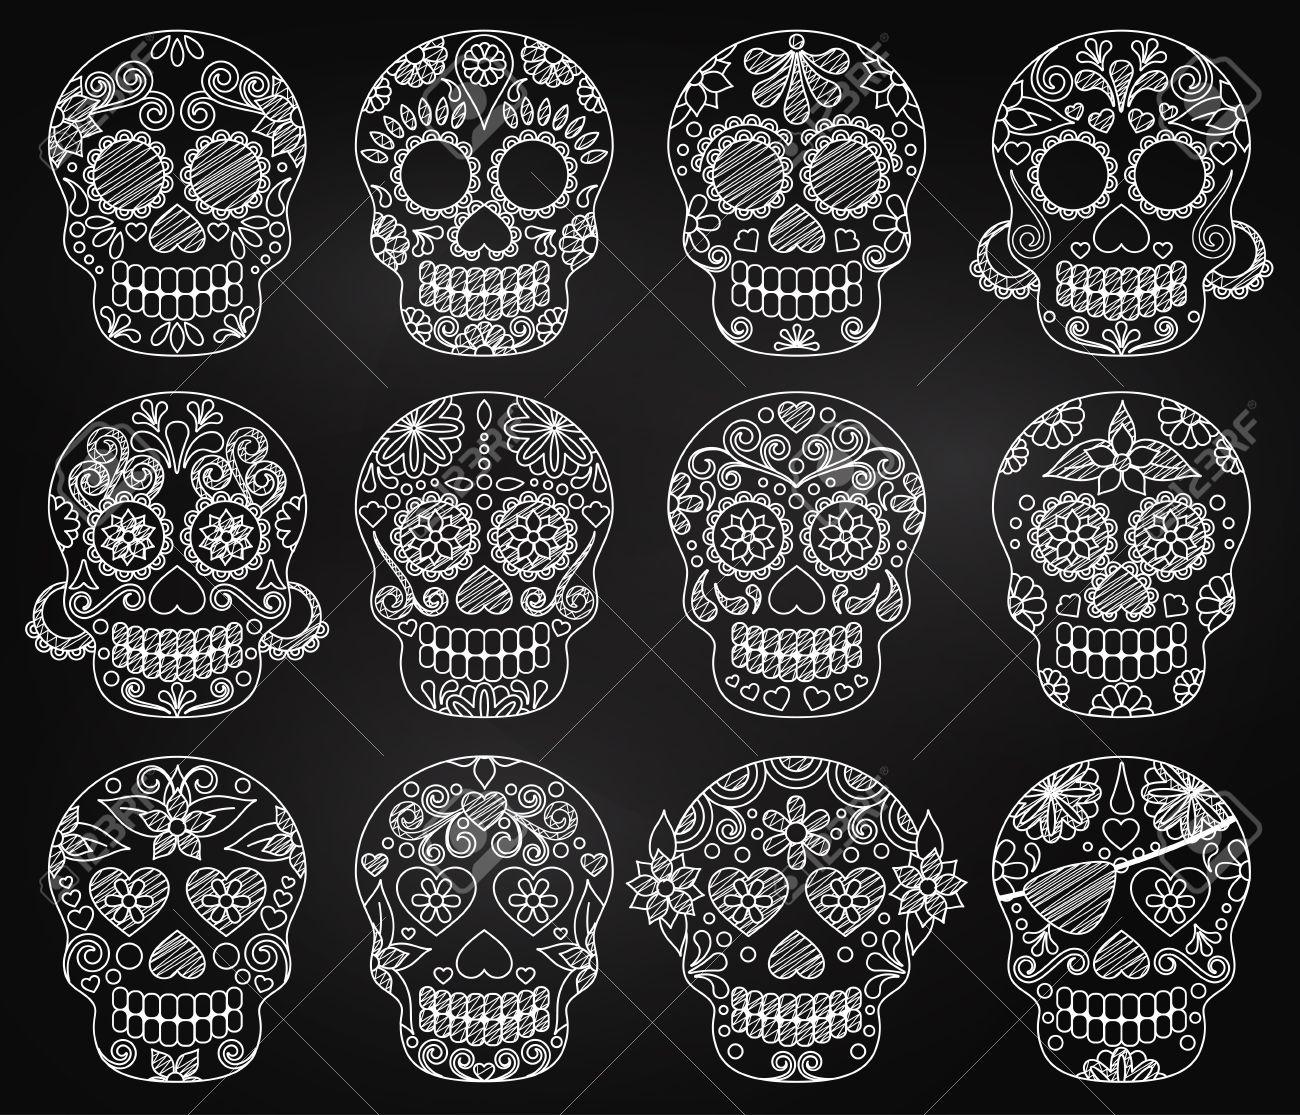 Vector Collection of Chalkboard Day of the Dead Skulls or Sugar Skulls - 45944595